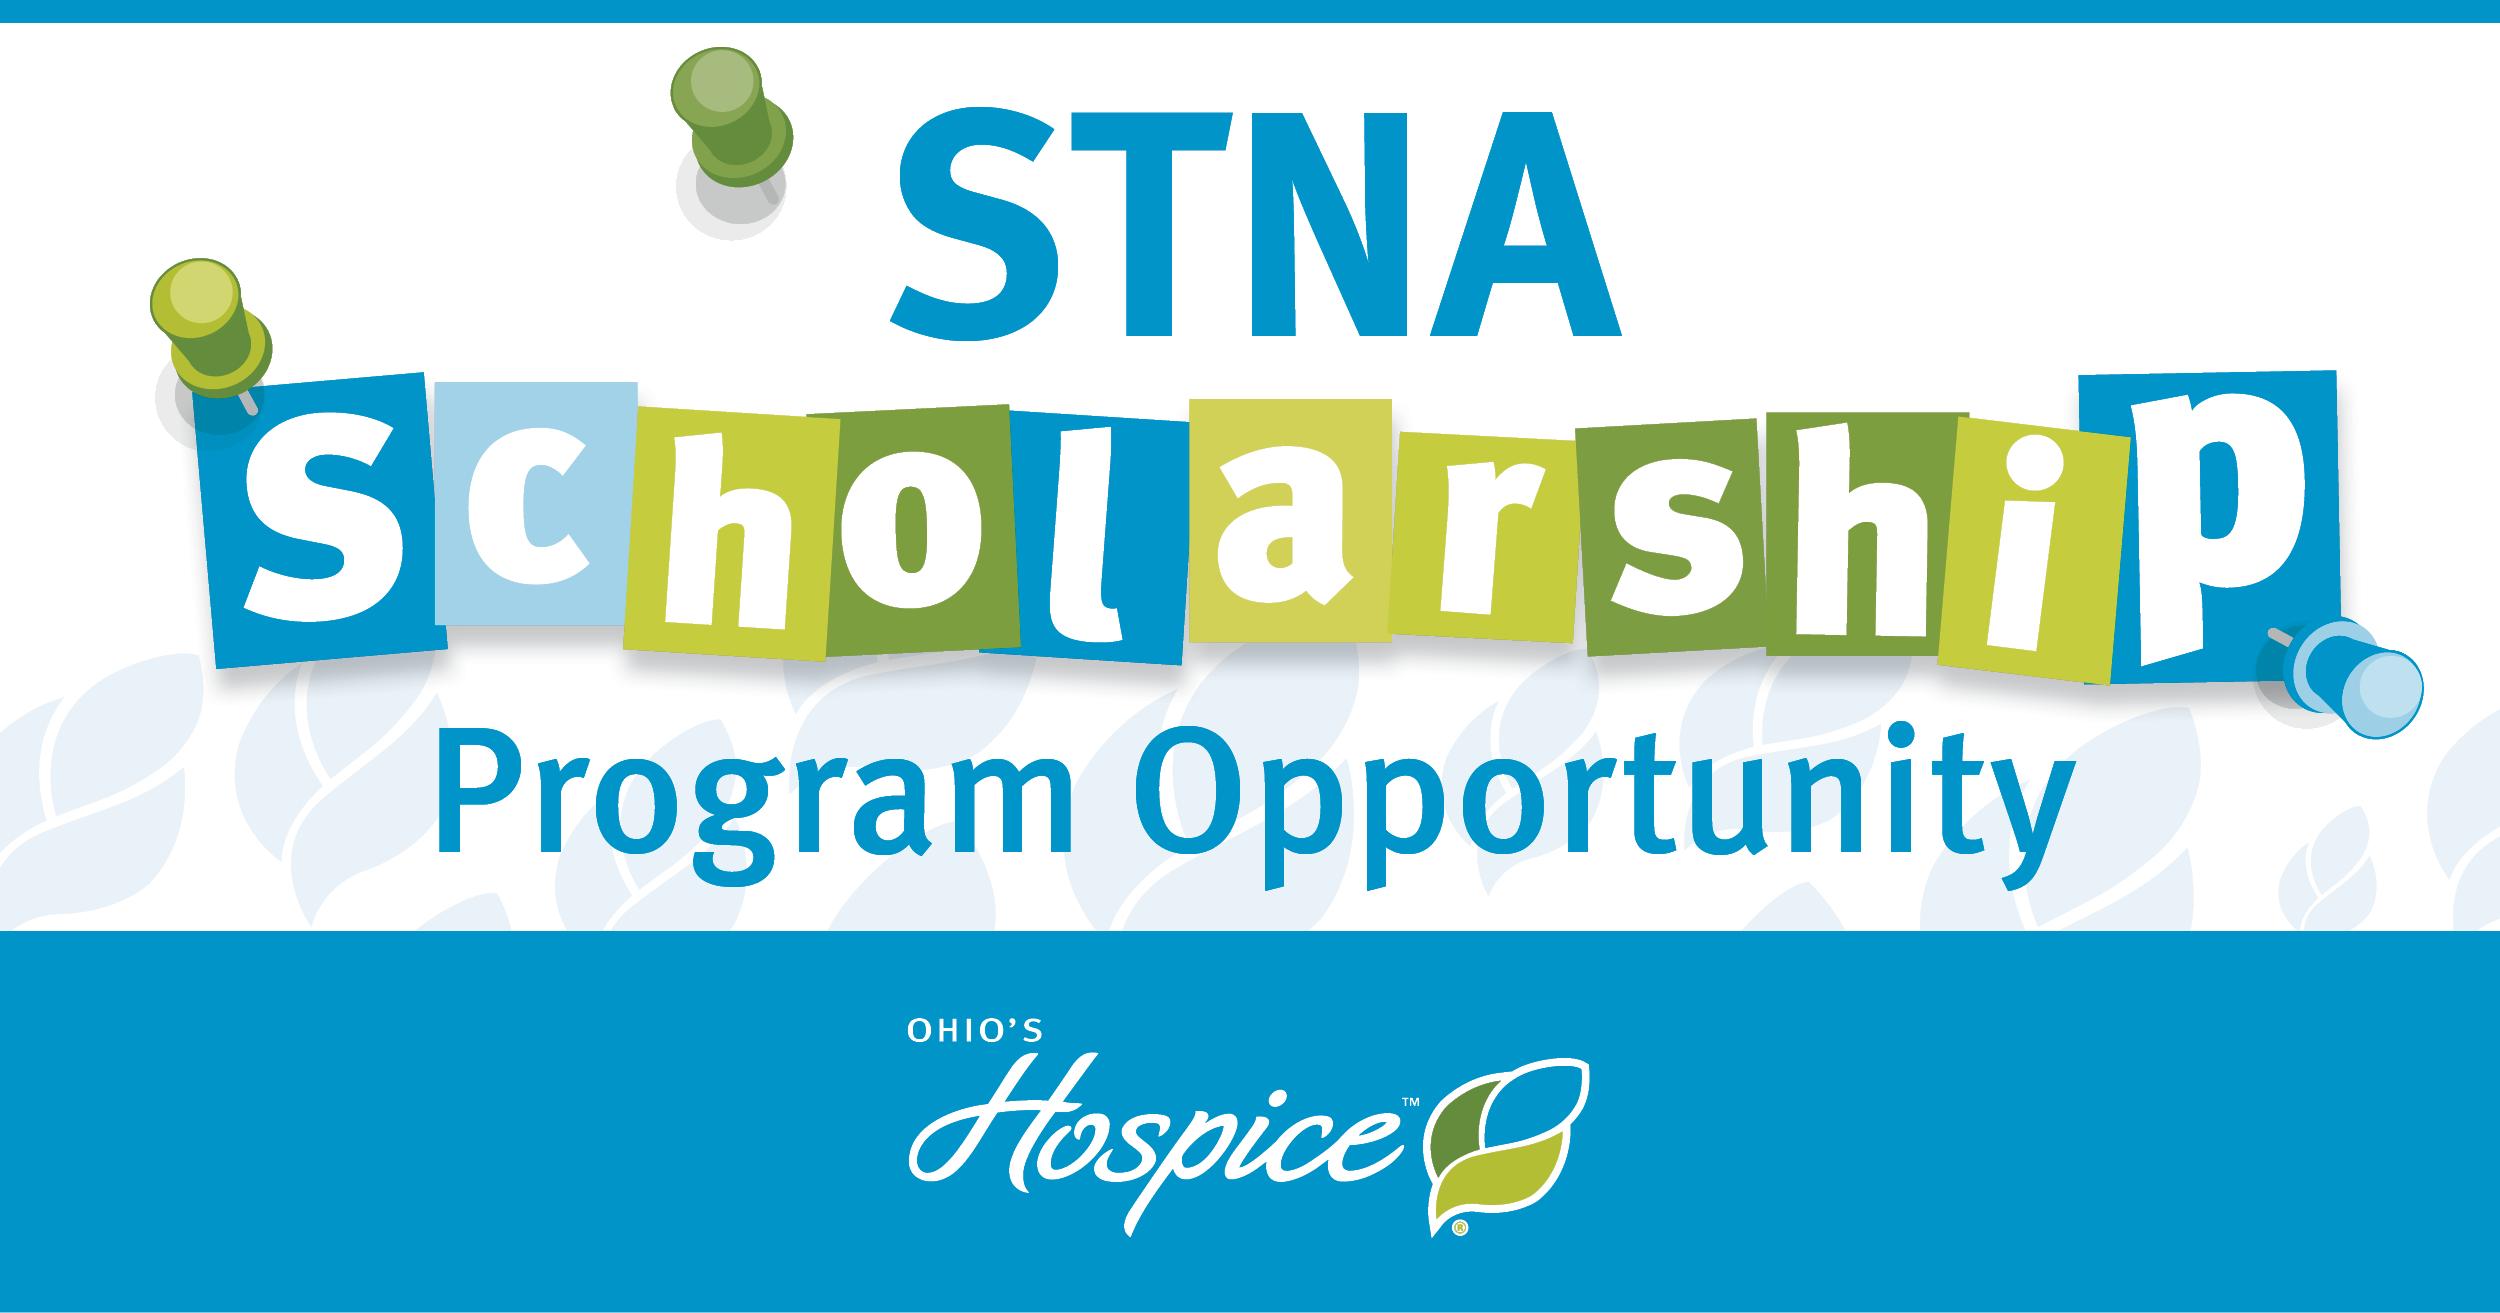 Ohio's Hospice Offers STNA Scholarship Program